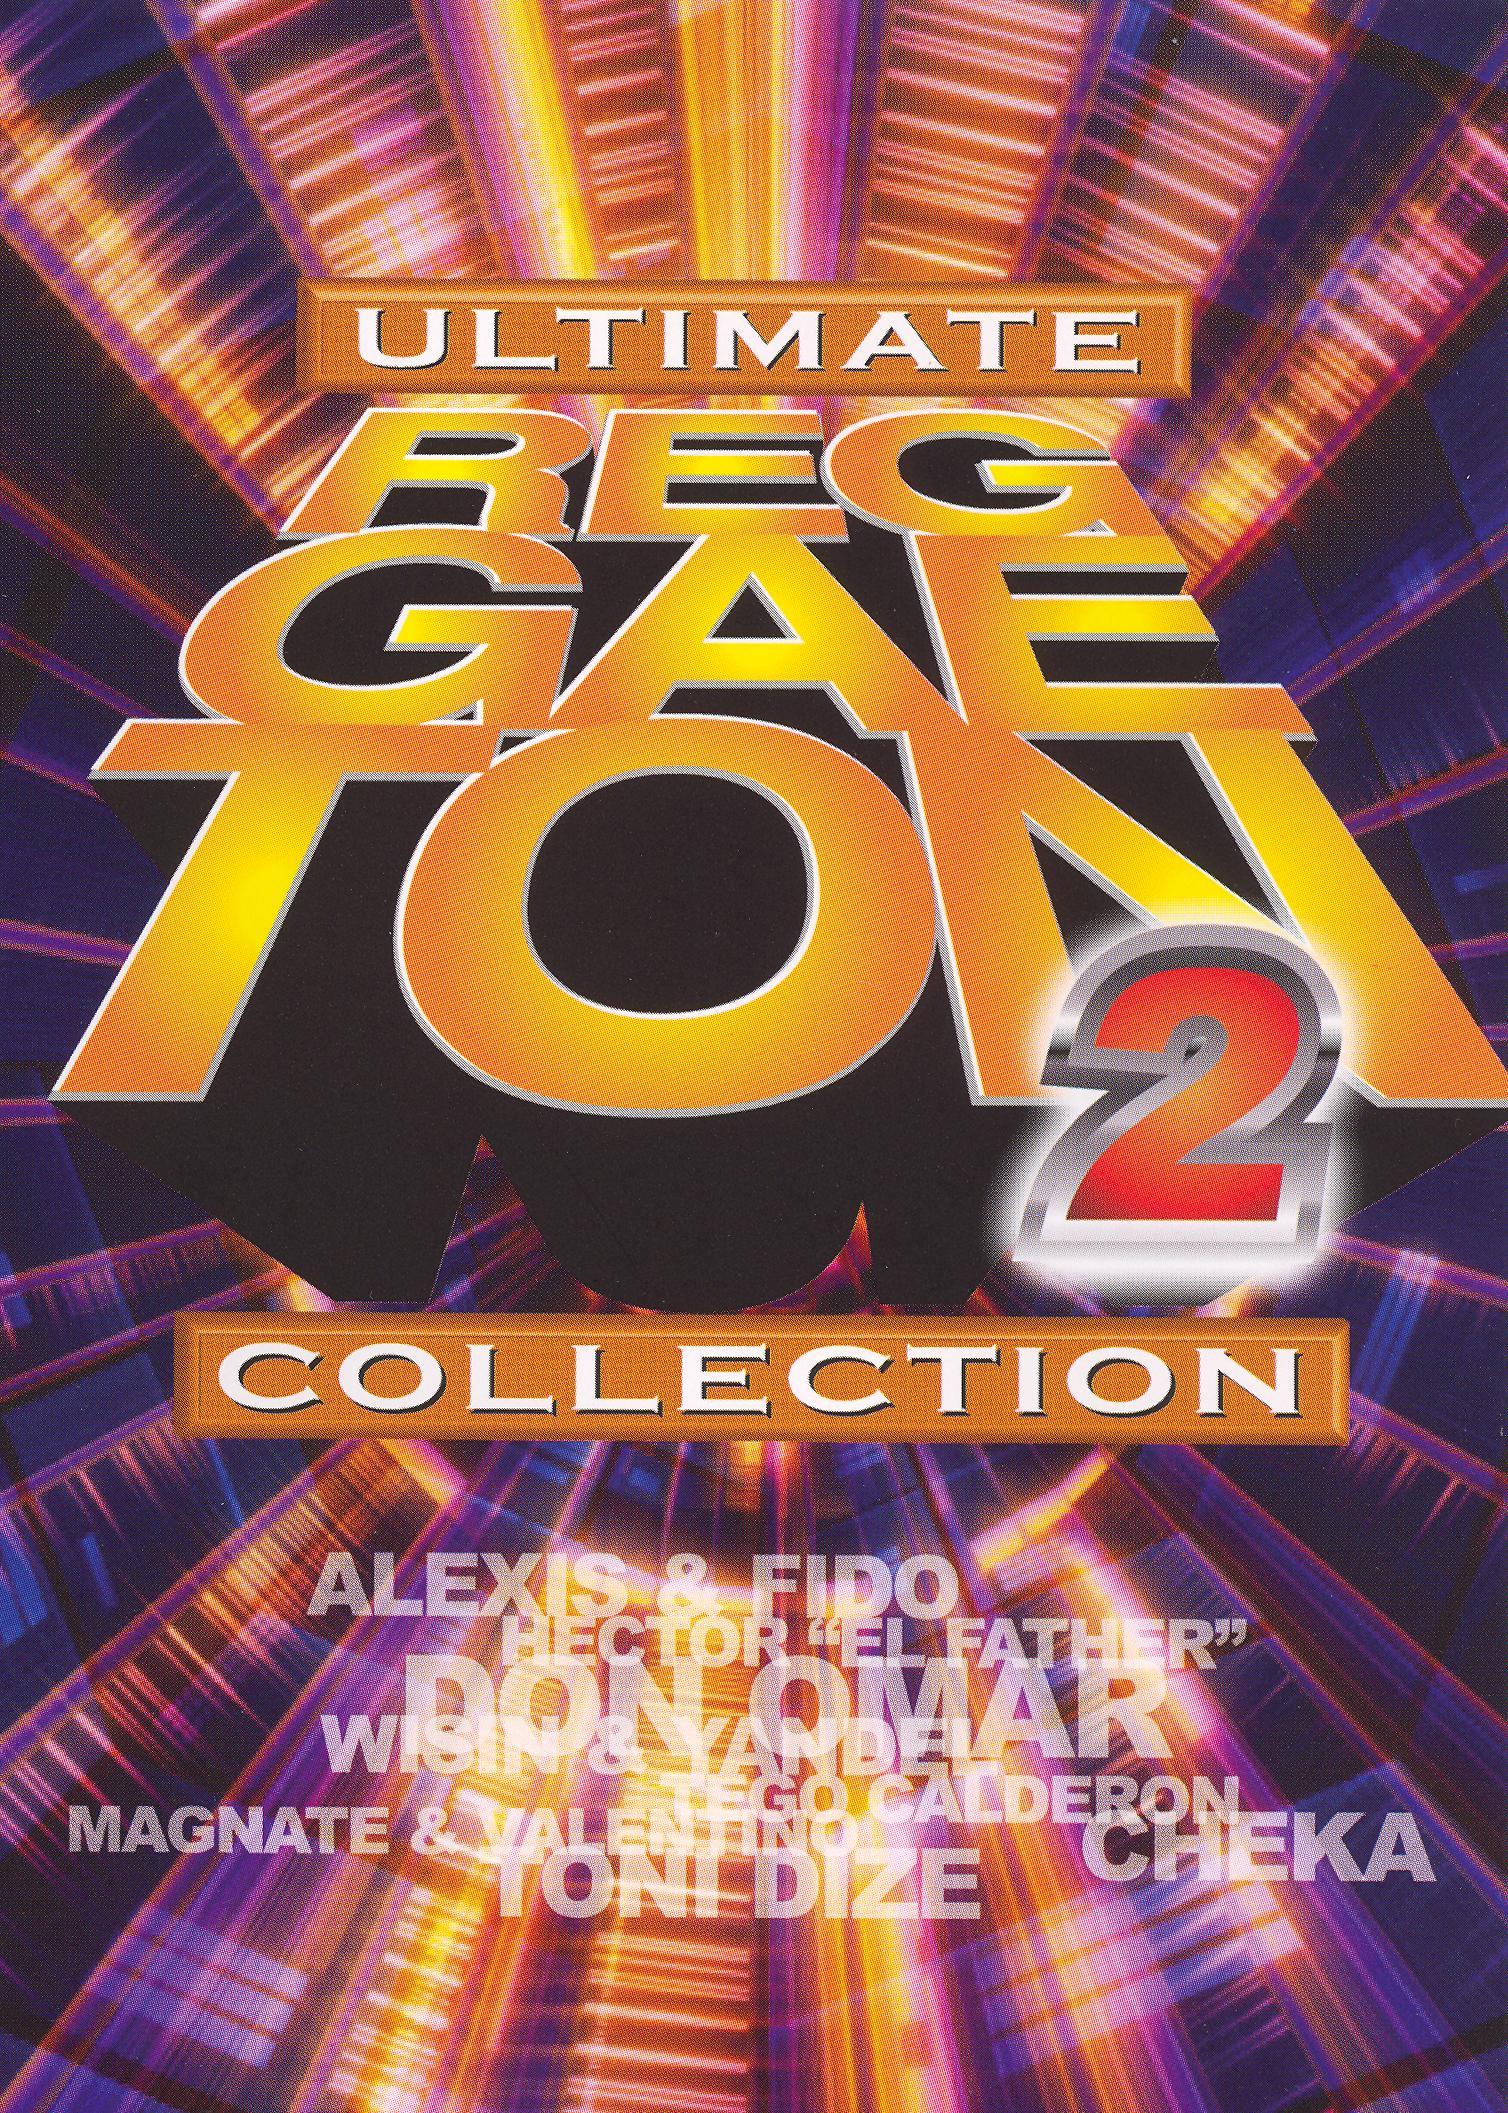 Ultimate Reggaeton Collection, Vol. 2